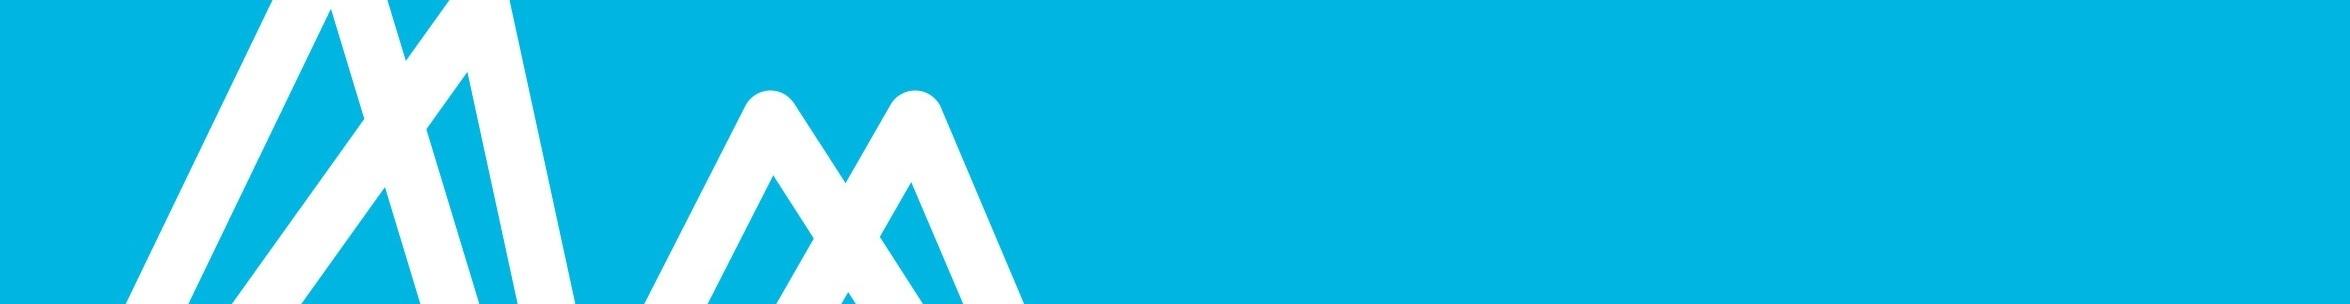 azure-header-trend7-135548-edited.jpg